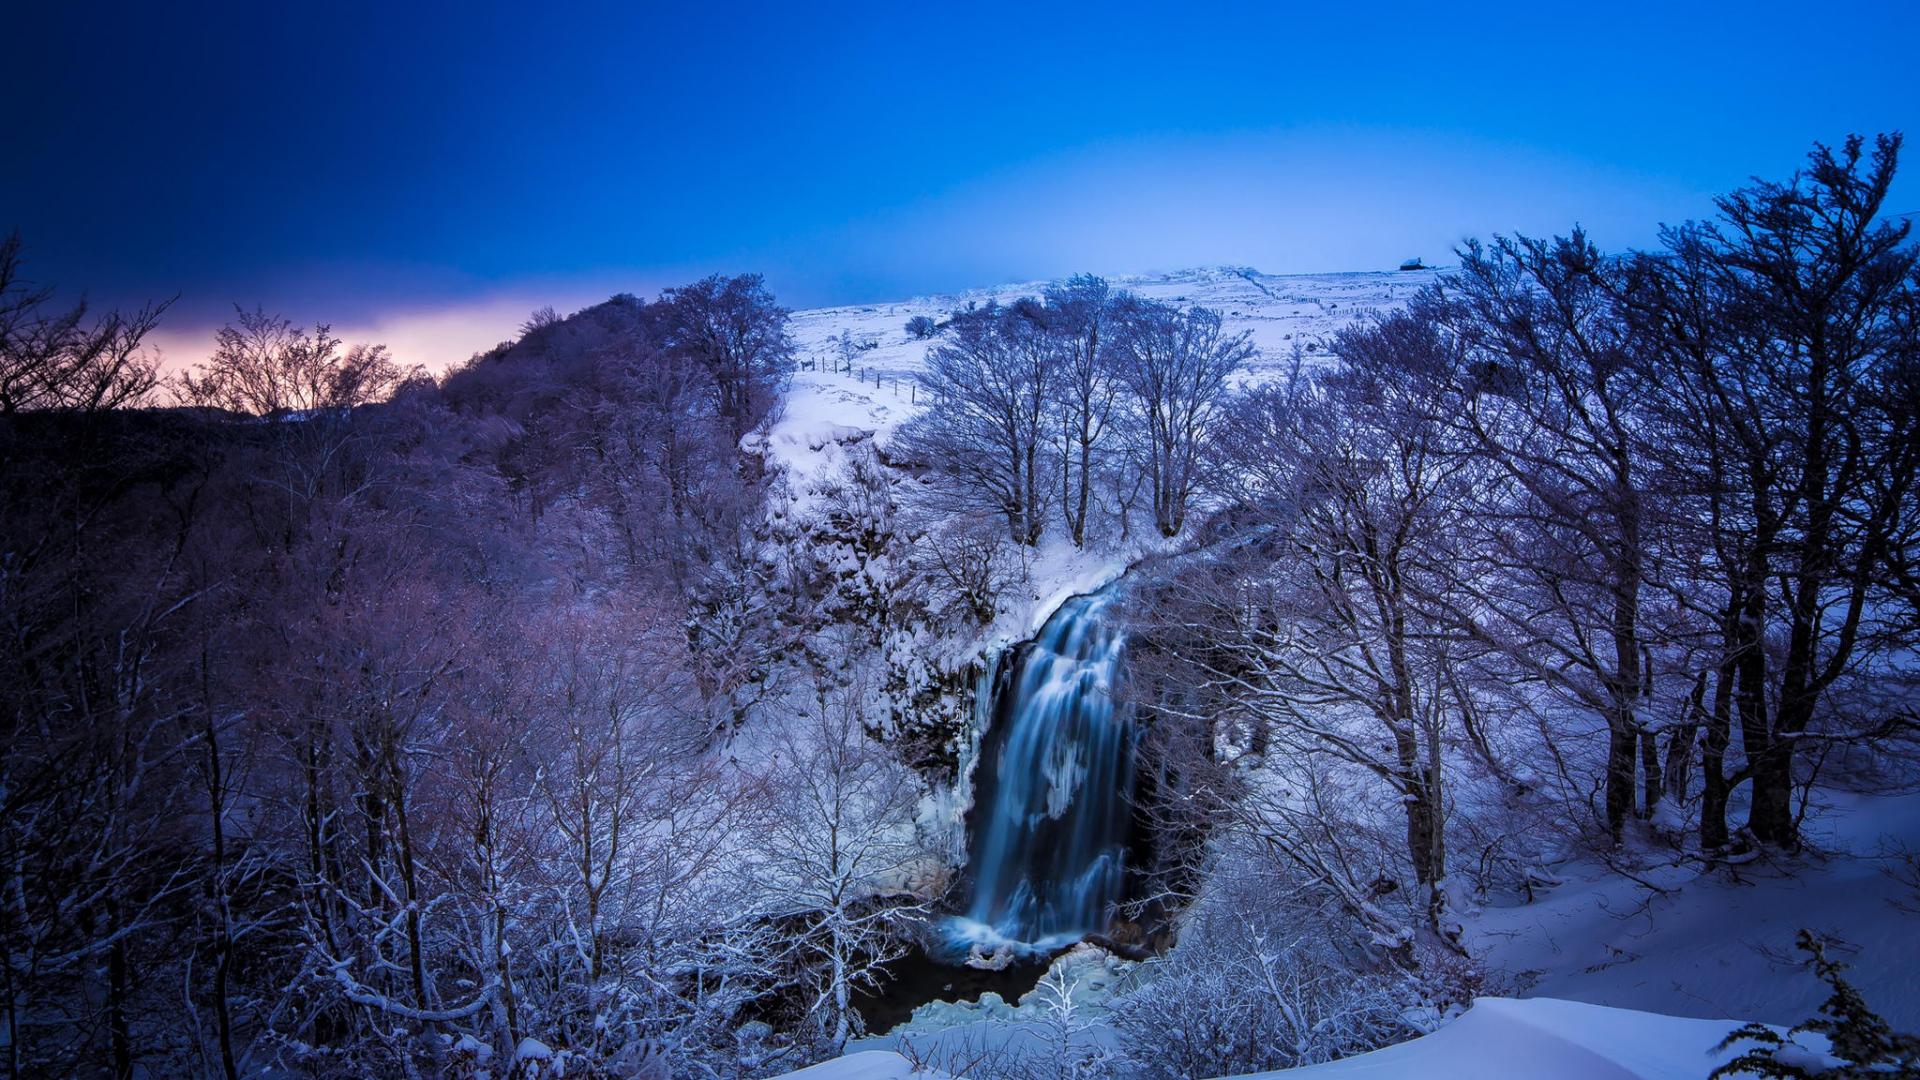 4k Nature Wallpaper Winter France: France Winter, HD Nature, 4k Wallpapers, Images